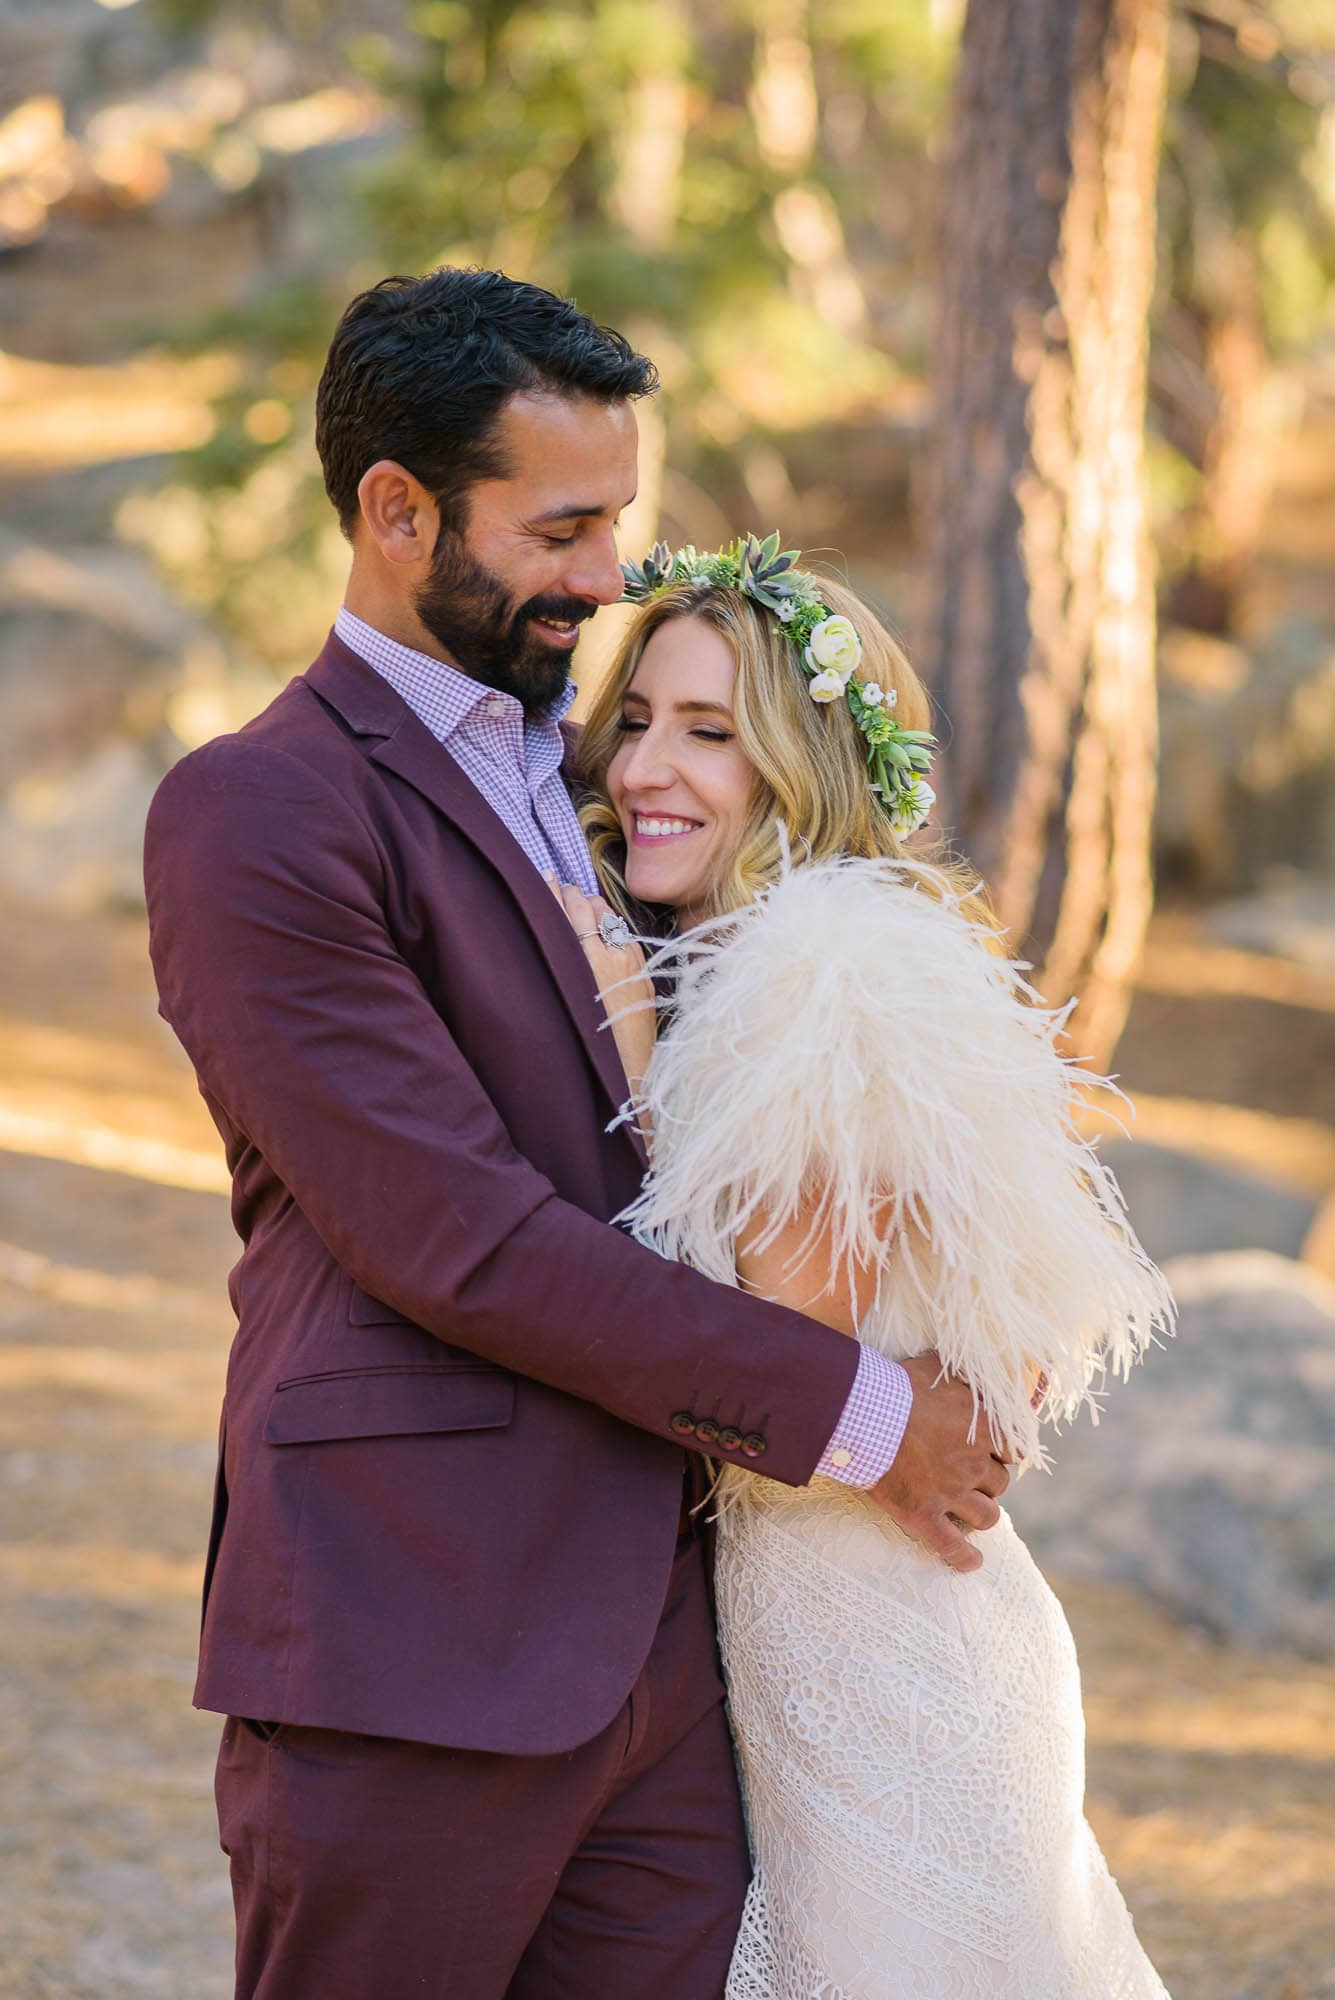 030_Alan_and_Heidi_Wedding_Natalie_Mike